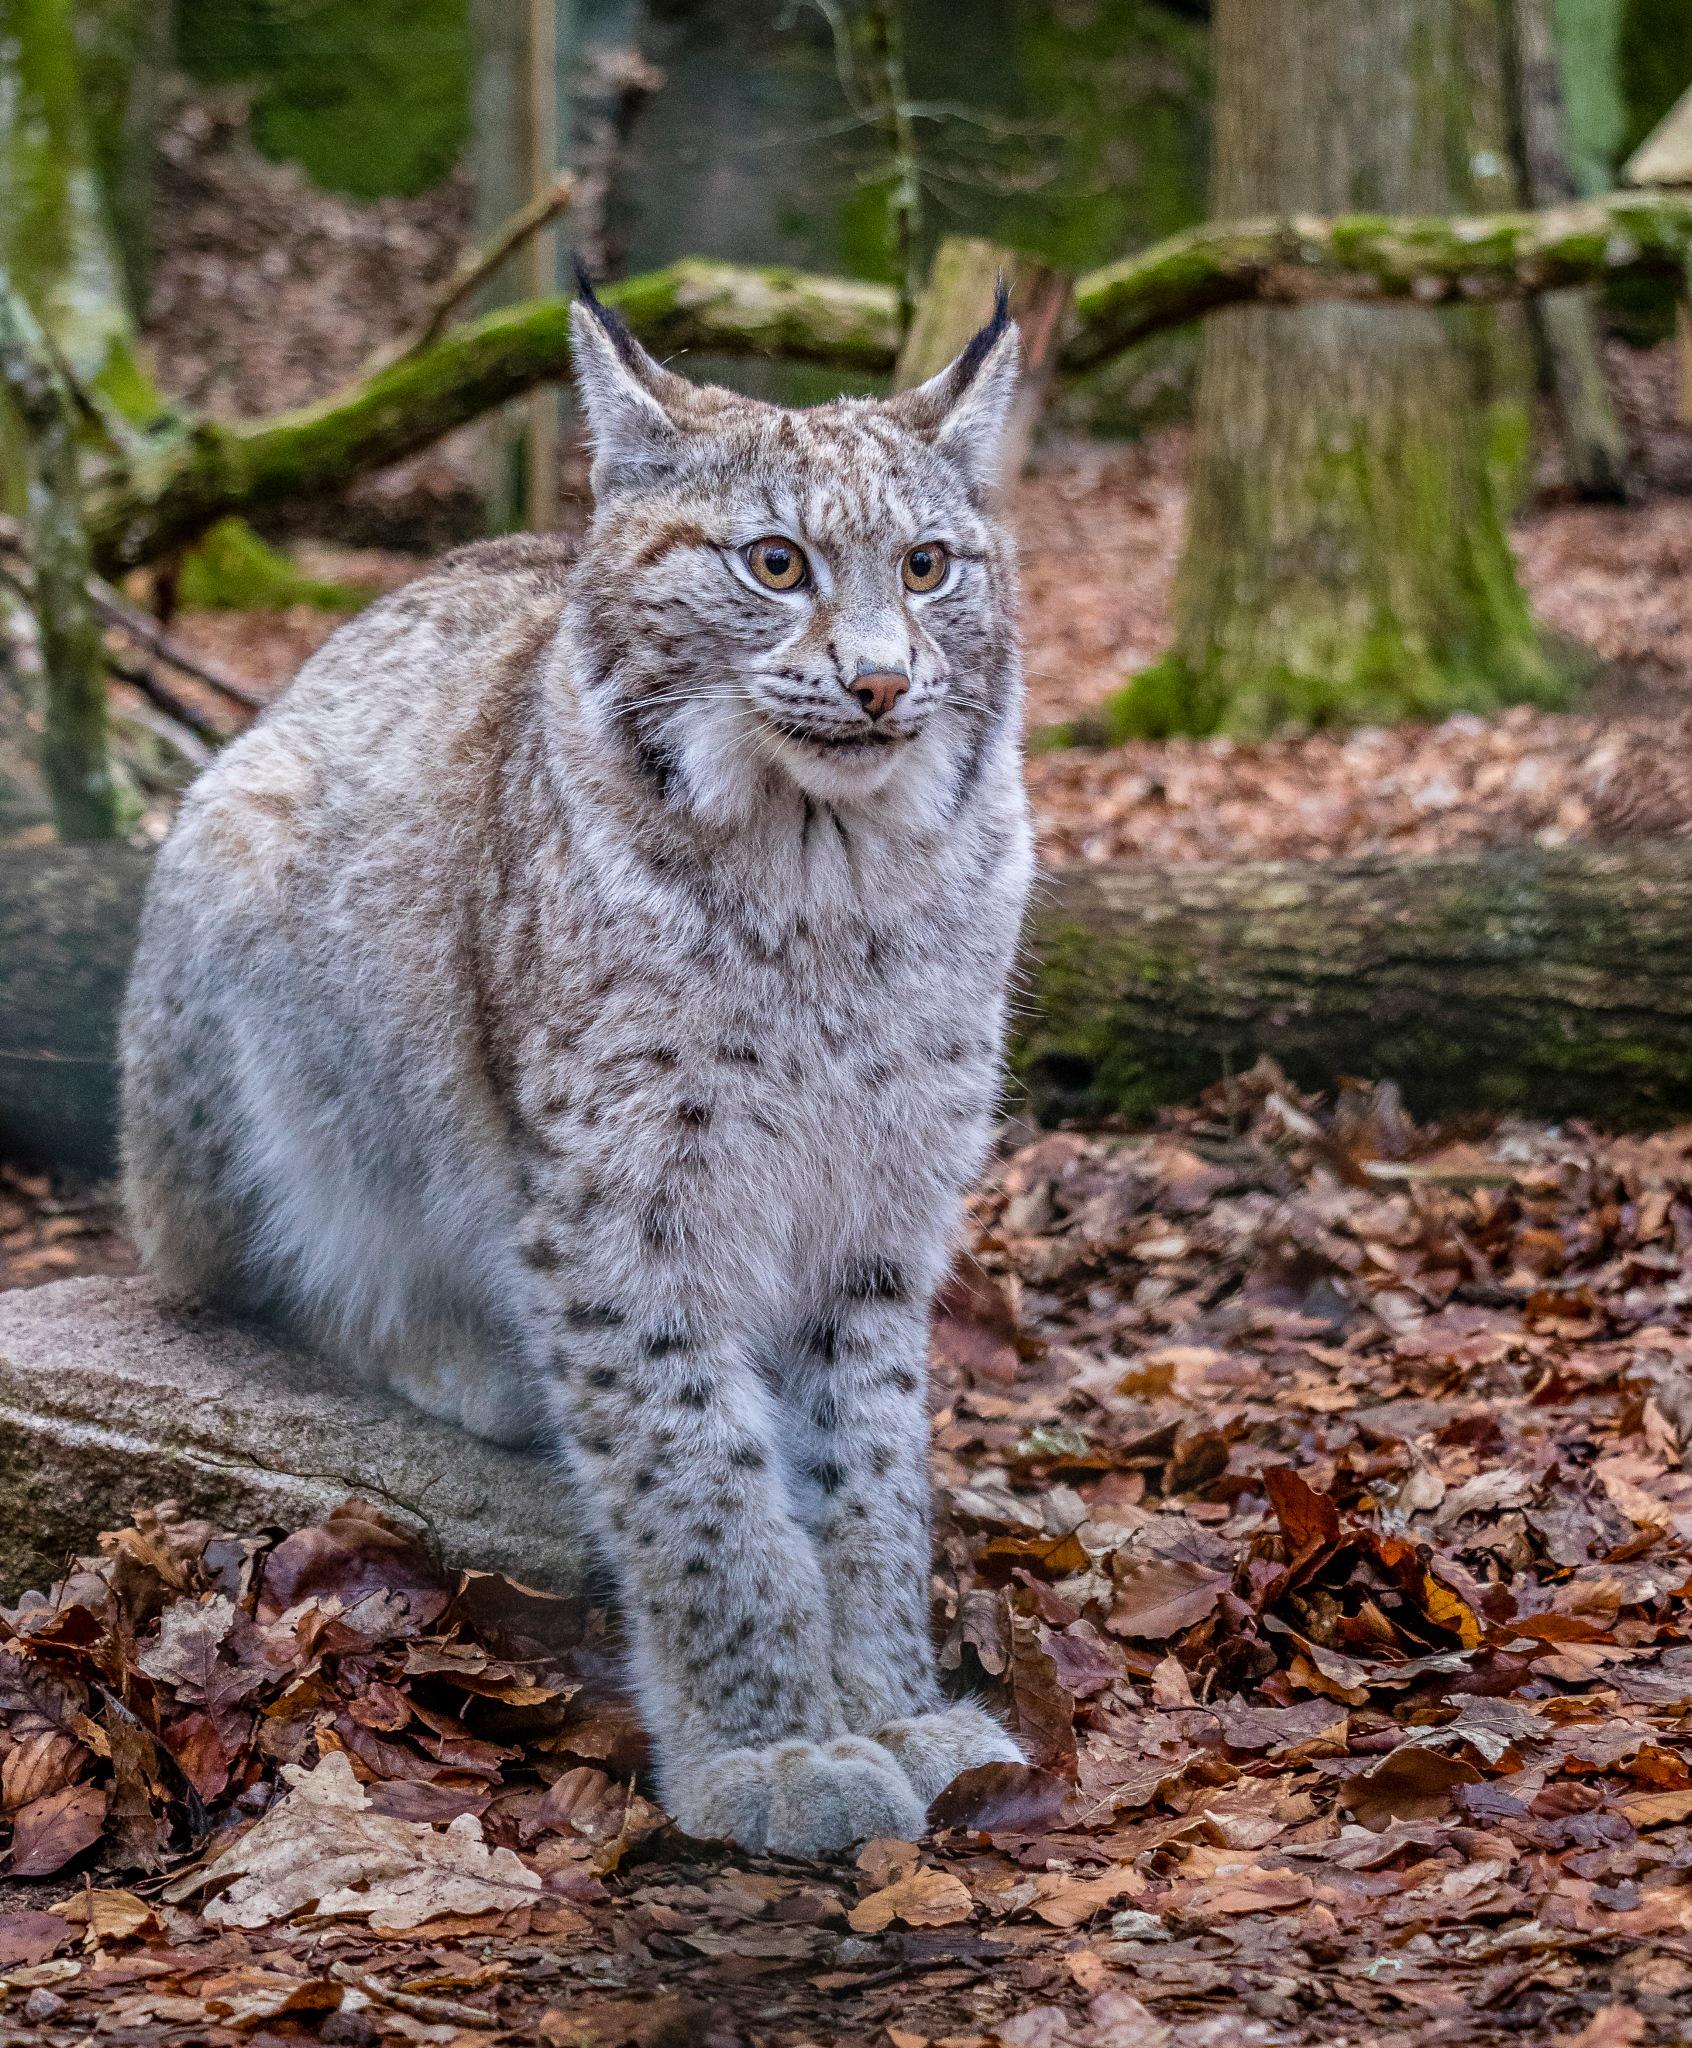 The Lynx by Kim Jonsson